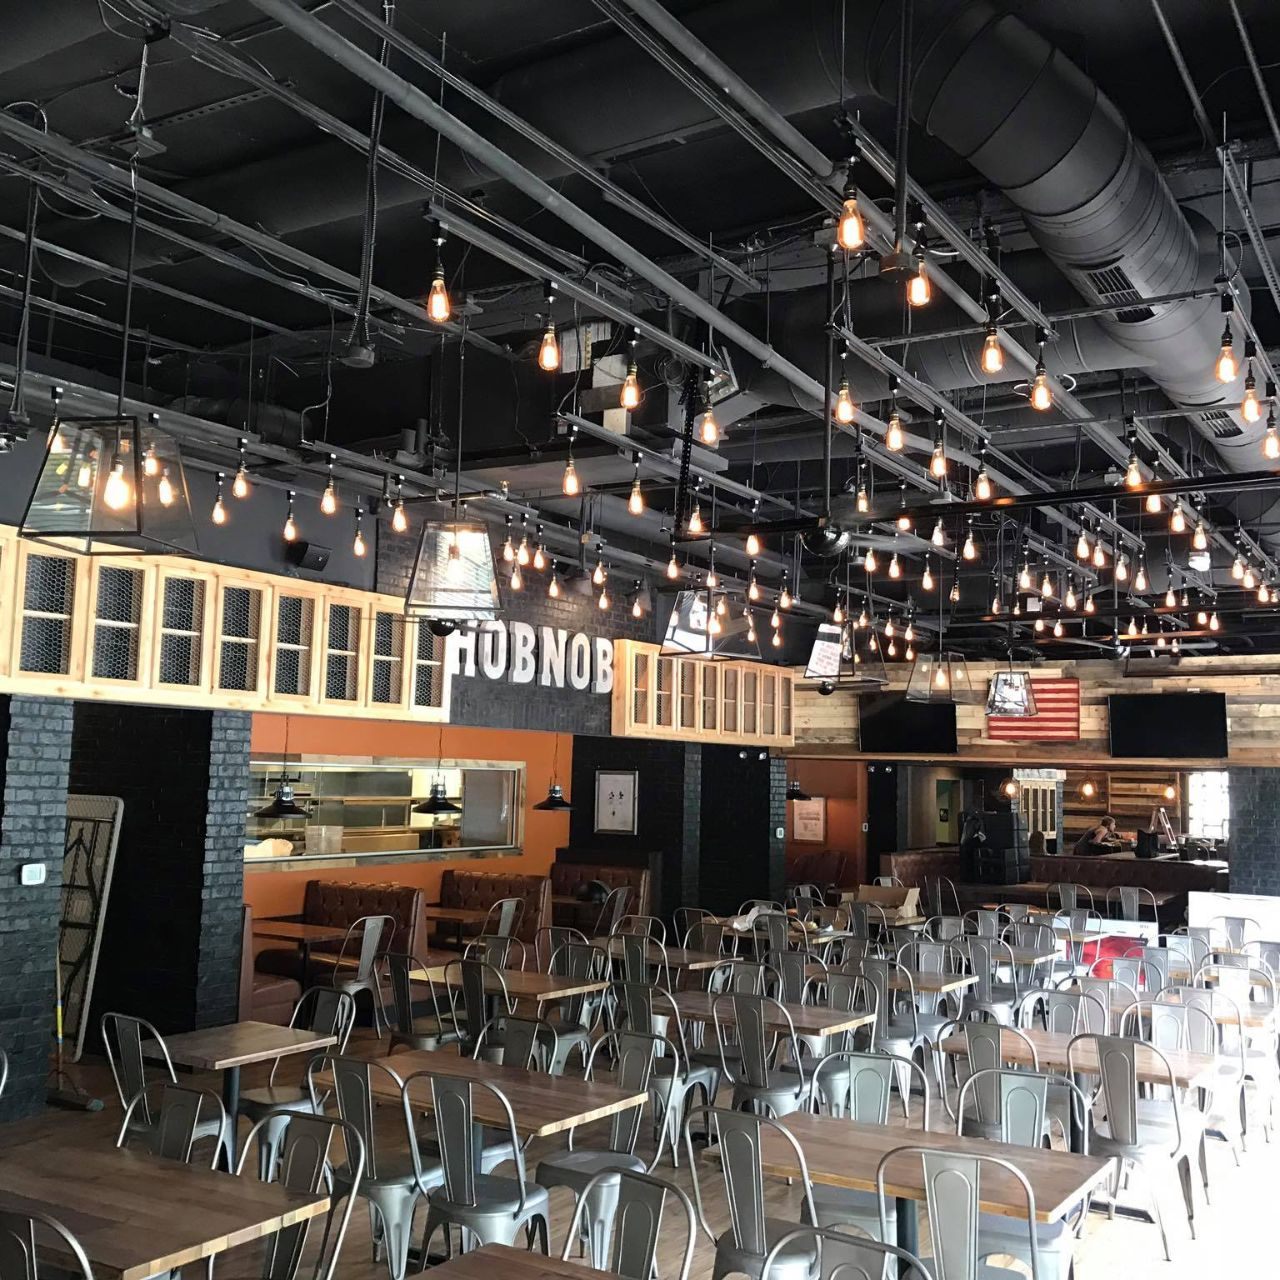 Where-To-Celebrate-Cinco-De-Mayo-&-Kentucky-Derby-In-Atlanta-GA-Eating-With-Erica-Atlanta-Food-Blogger-Livingston-Restaurant-&Bar-Atlanta-Date-Night-Atlanta-Events-Atlanta-Restaurant-regent-cocktail-club-american-cut